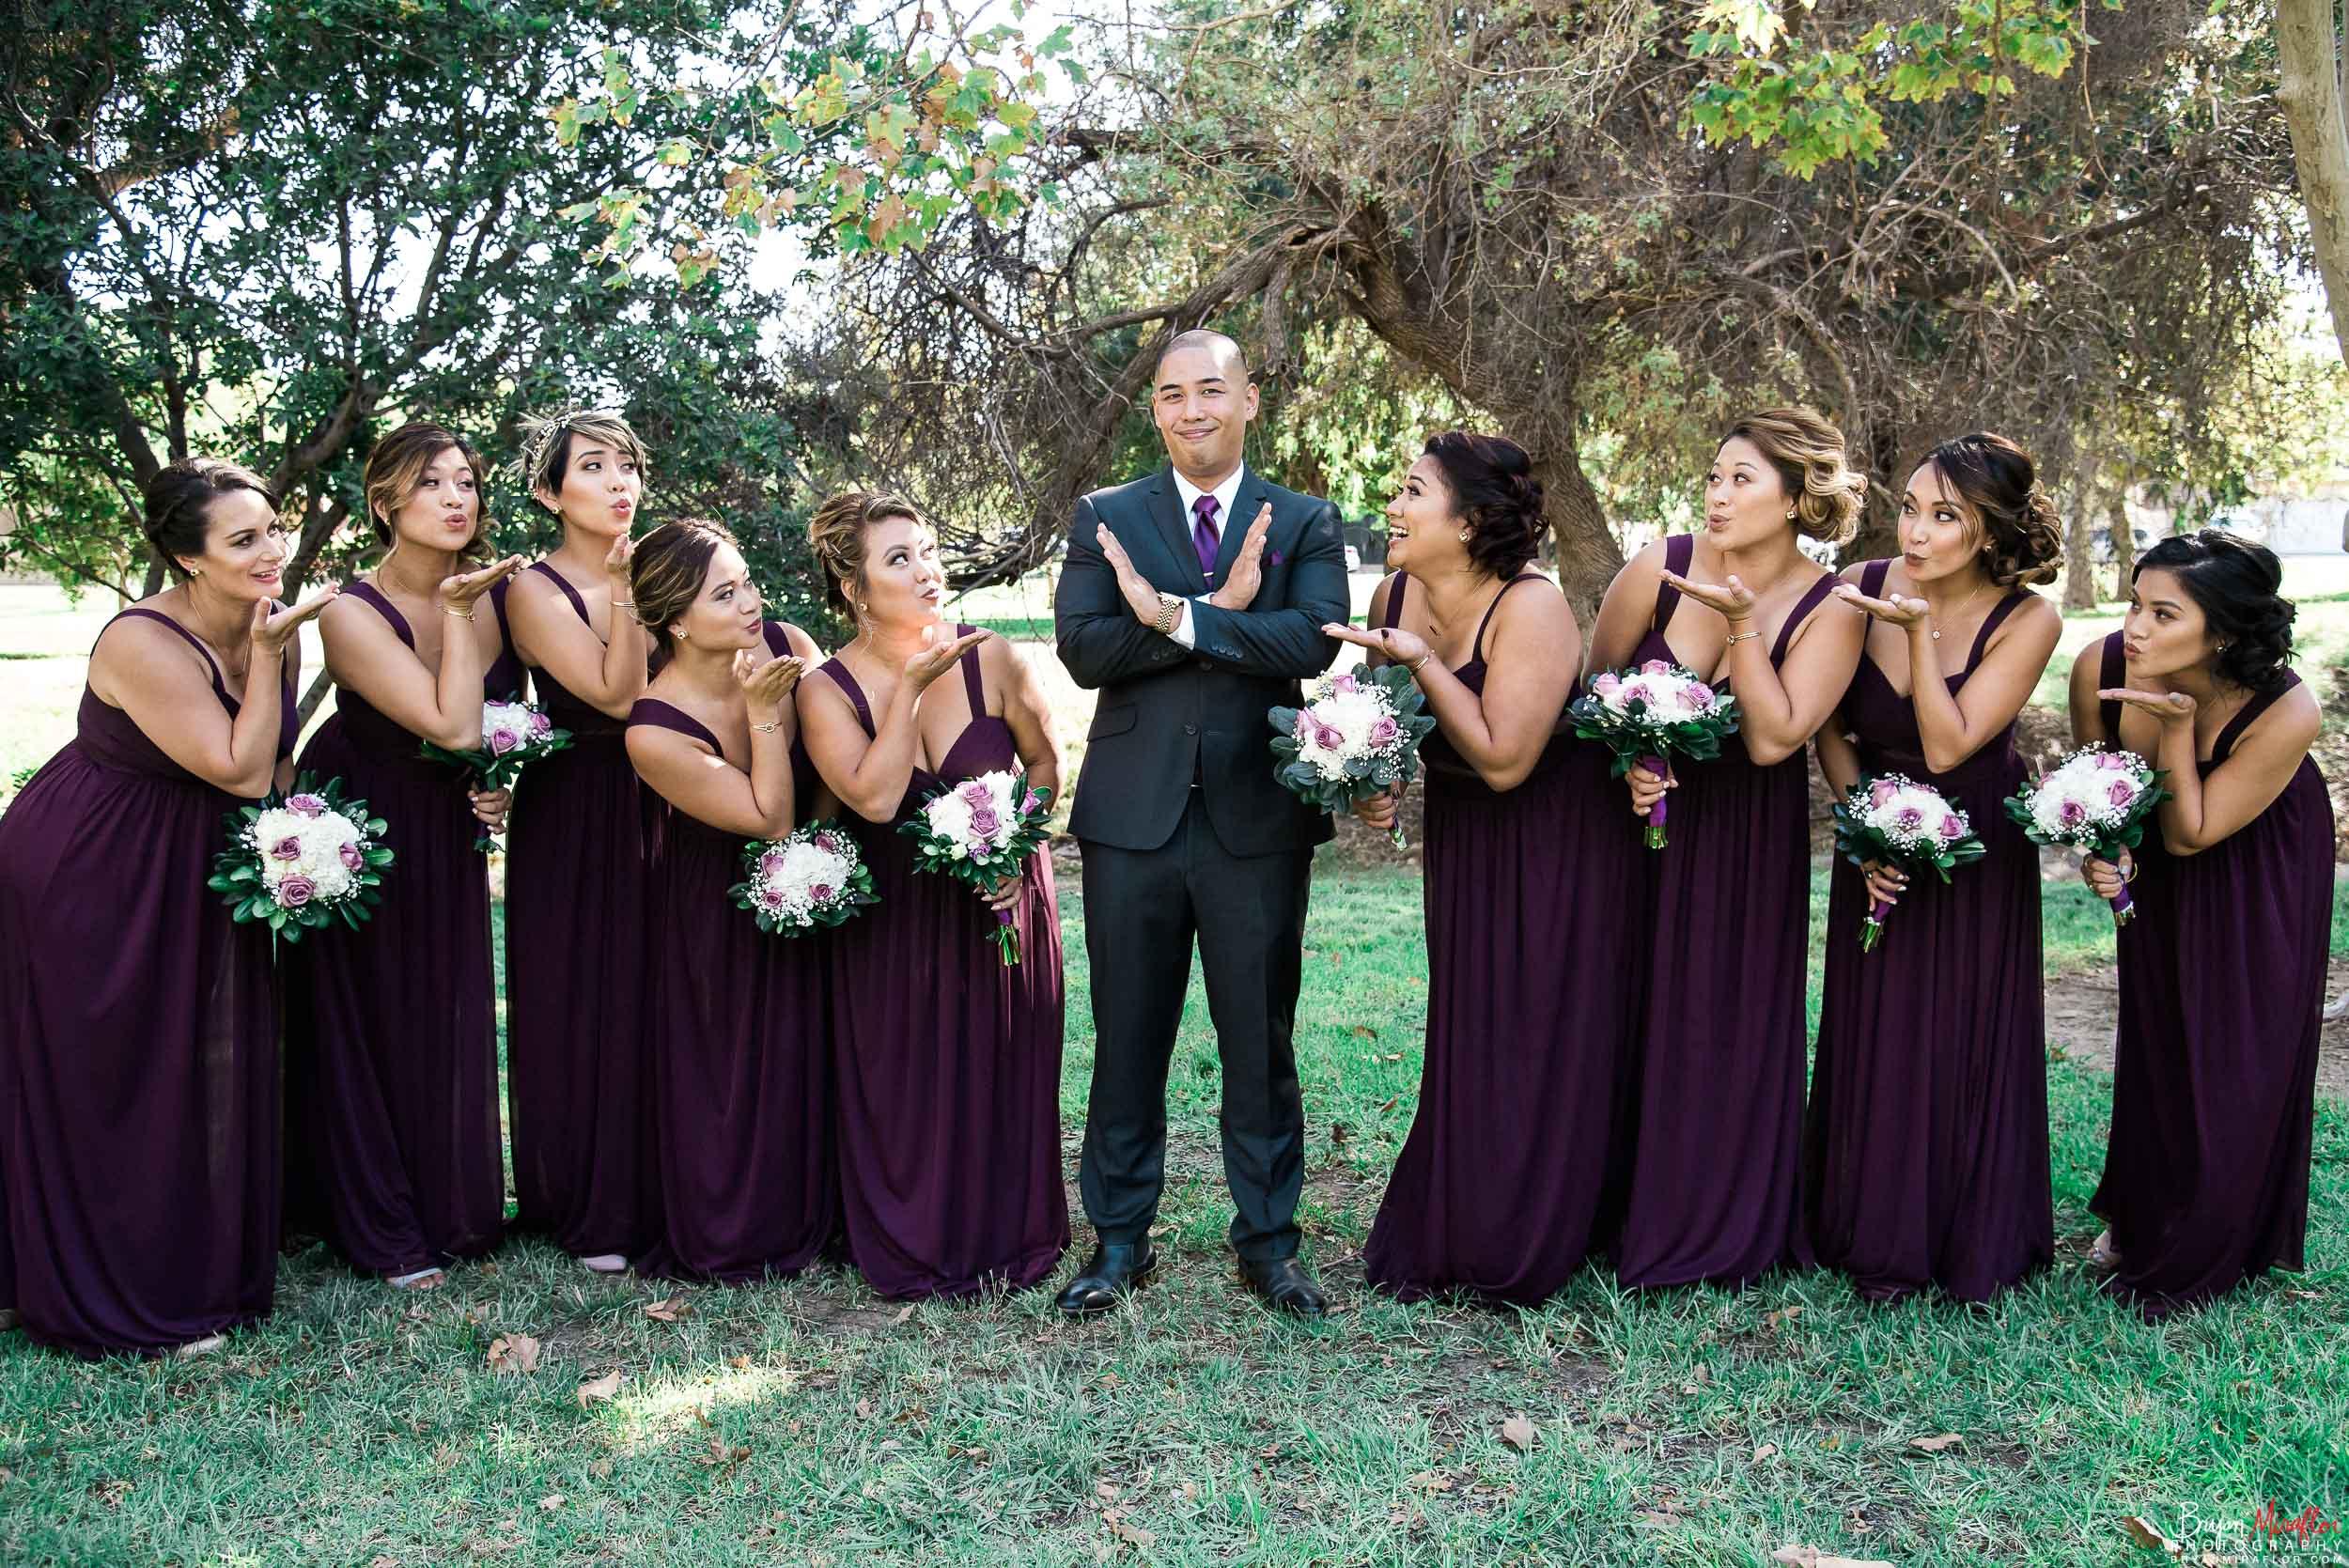 Bryan-Miraflor-Photography-Trisha-Dexter-Married-20170923-036.jpg